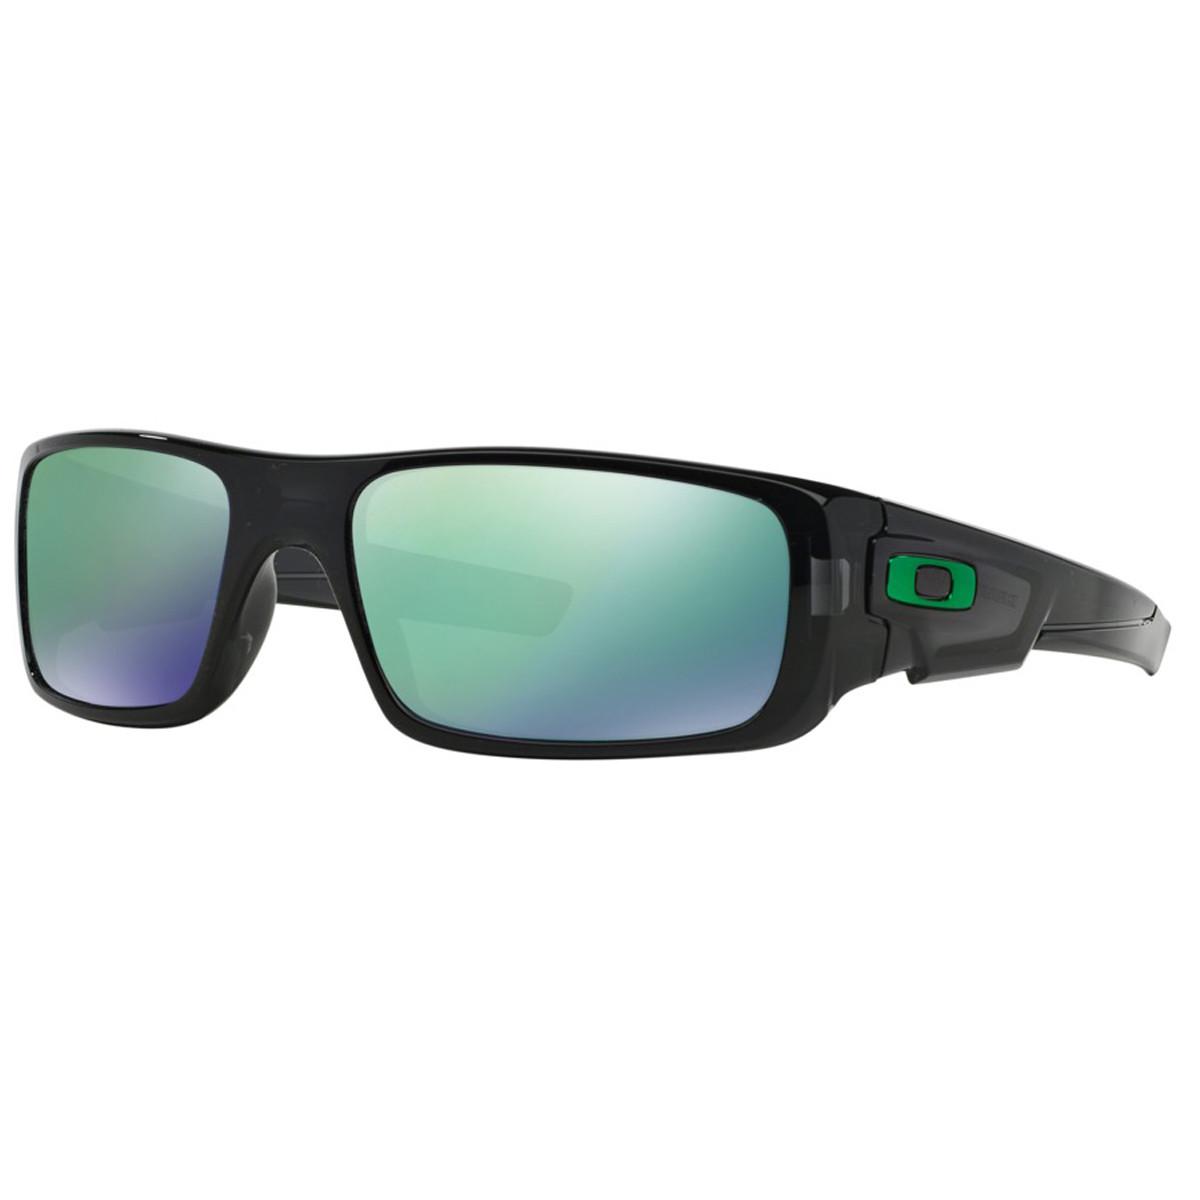 865653bcca9aa Óculos Oakley Crankshaft Black Ink  Jade Iridium ref OO9239-02